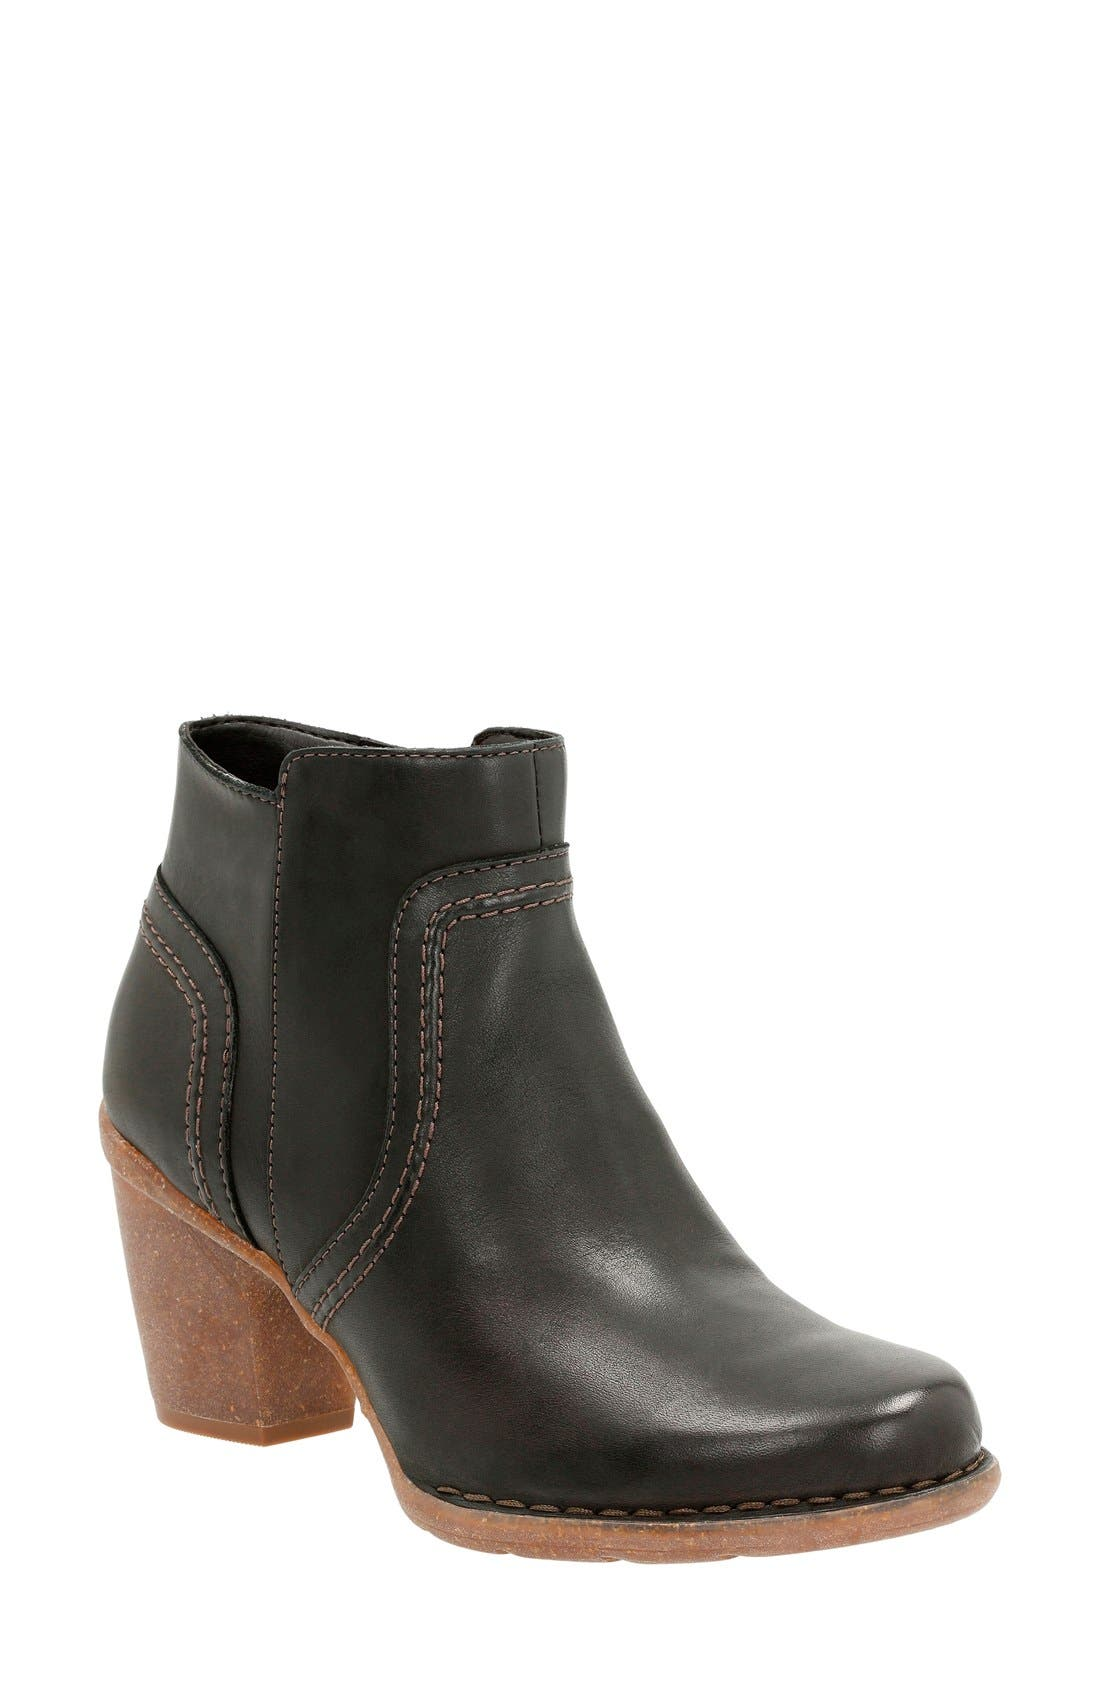 'Carleta Paris' Ankle Boot,                         Main,                         color, Black Leather